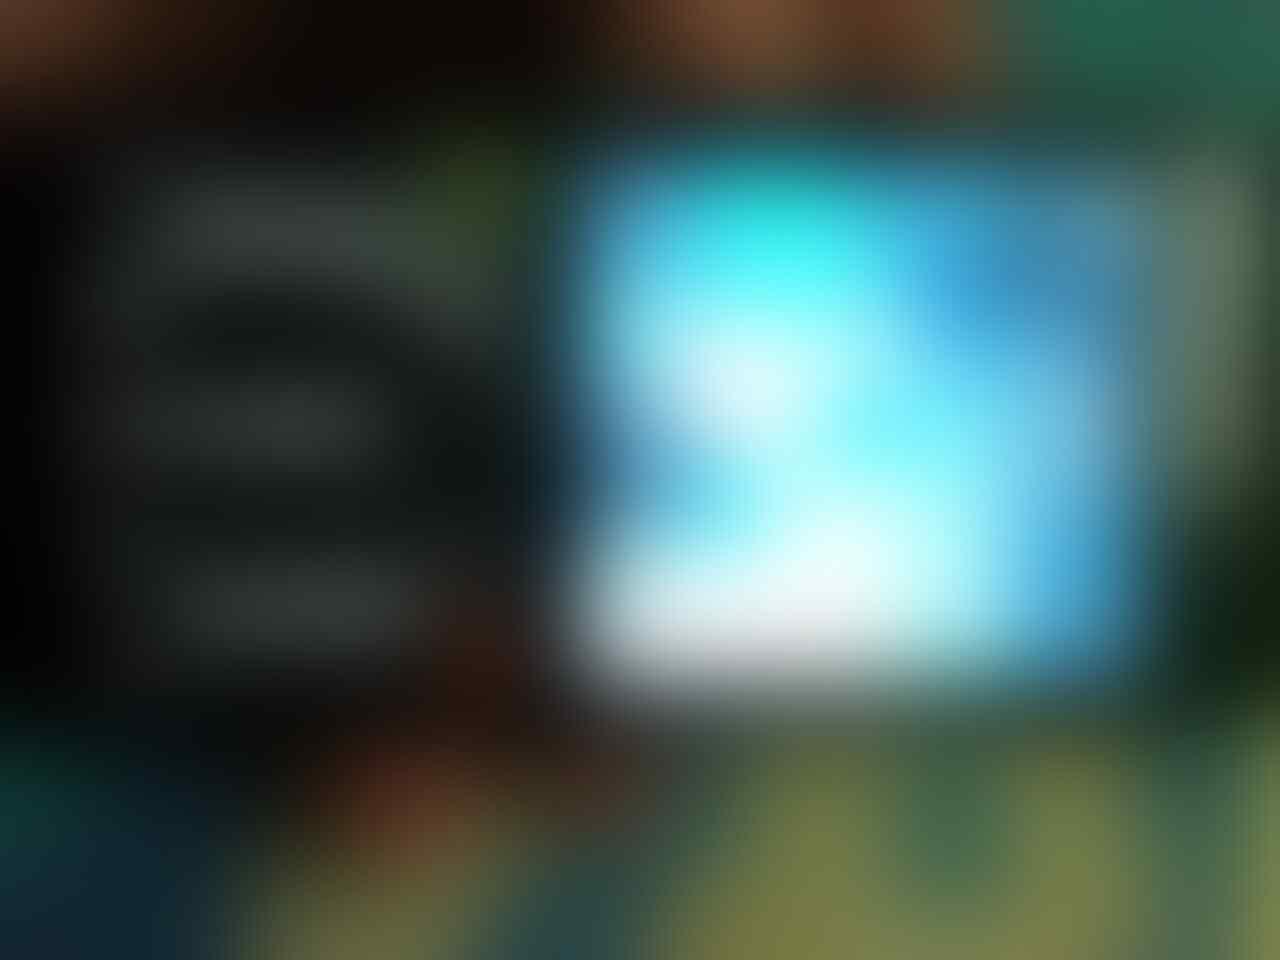 JUAL 3 Blackberry 1 Android MINUS MURAH (BU)